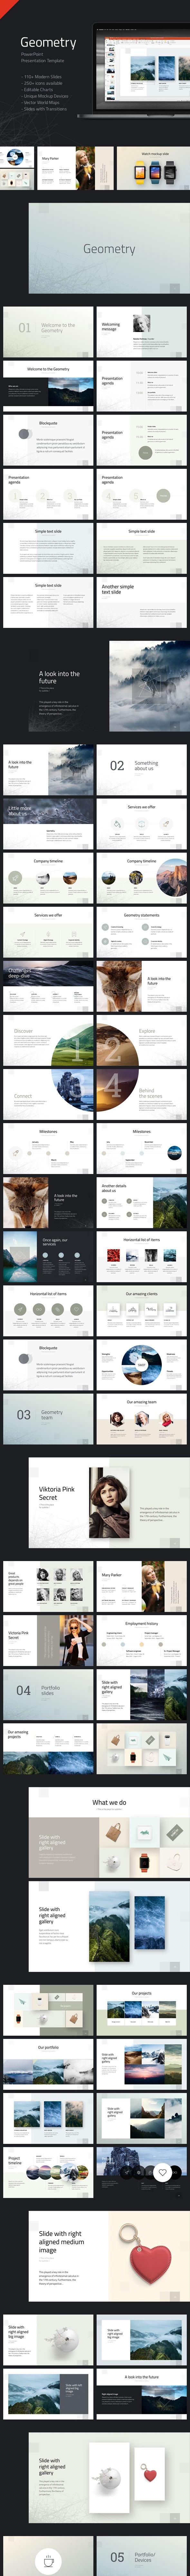 Geometry PowerPoint Presentation Template - Creative PowerPoint Templates